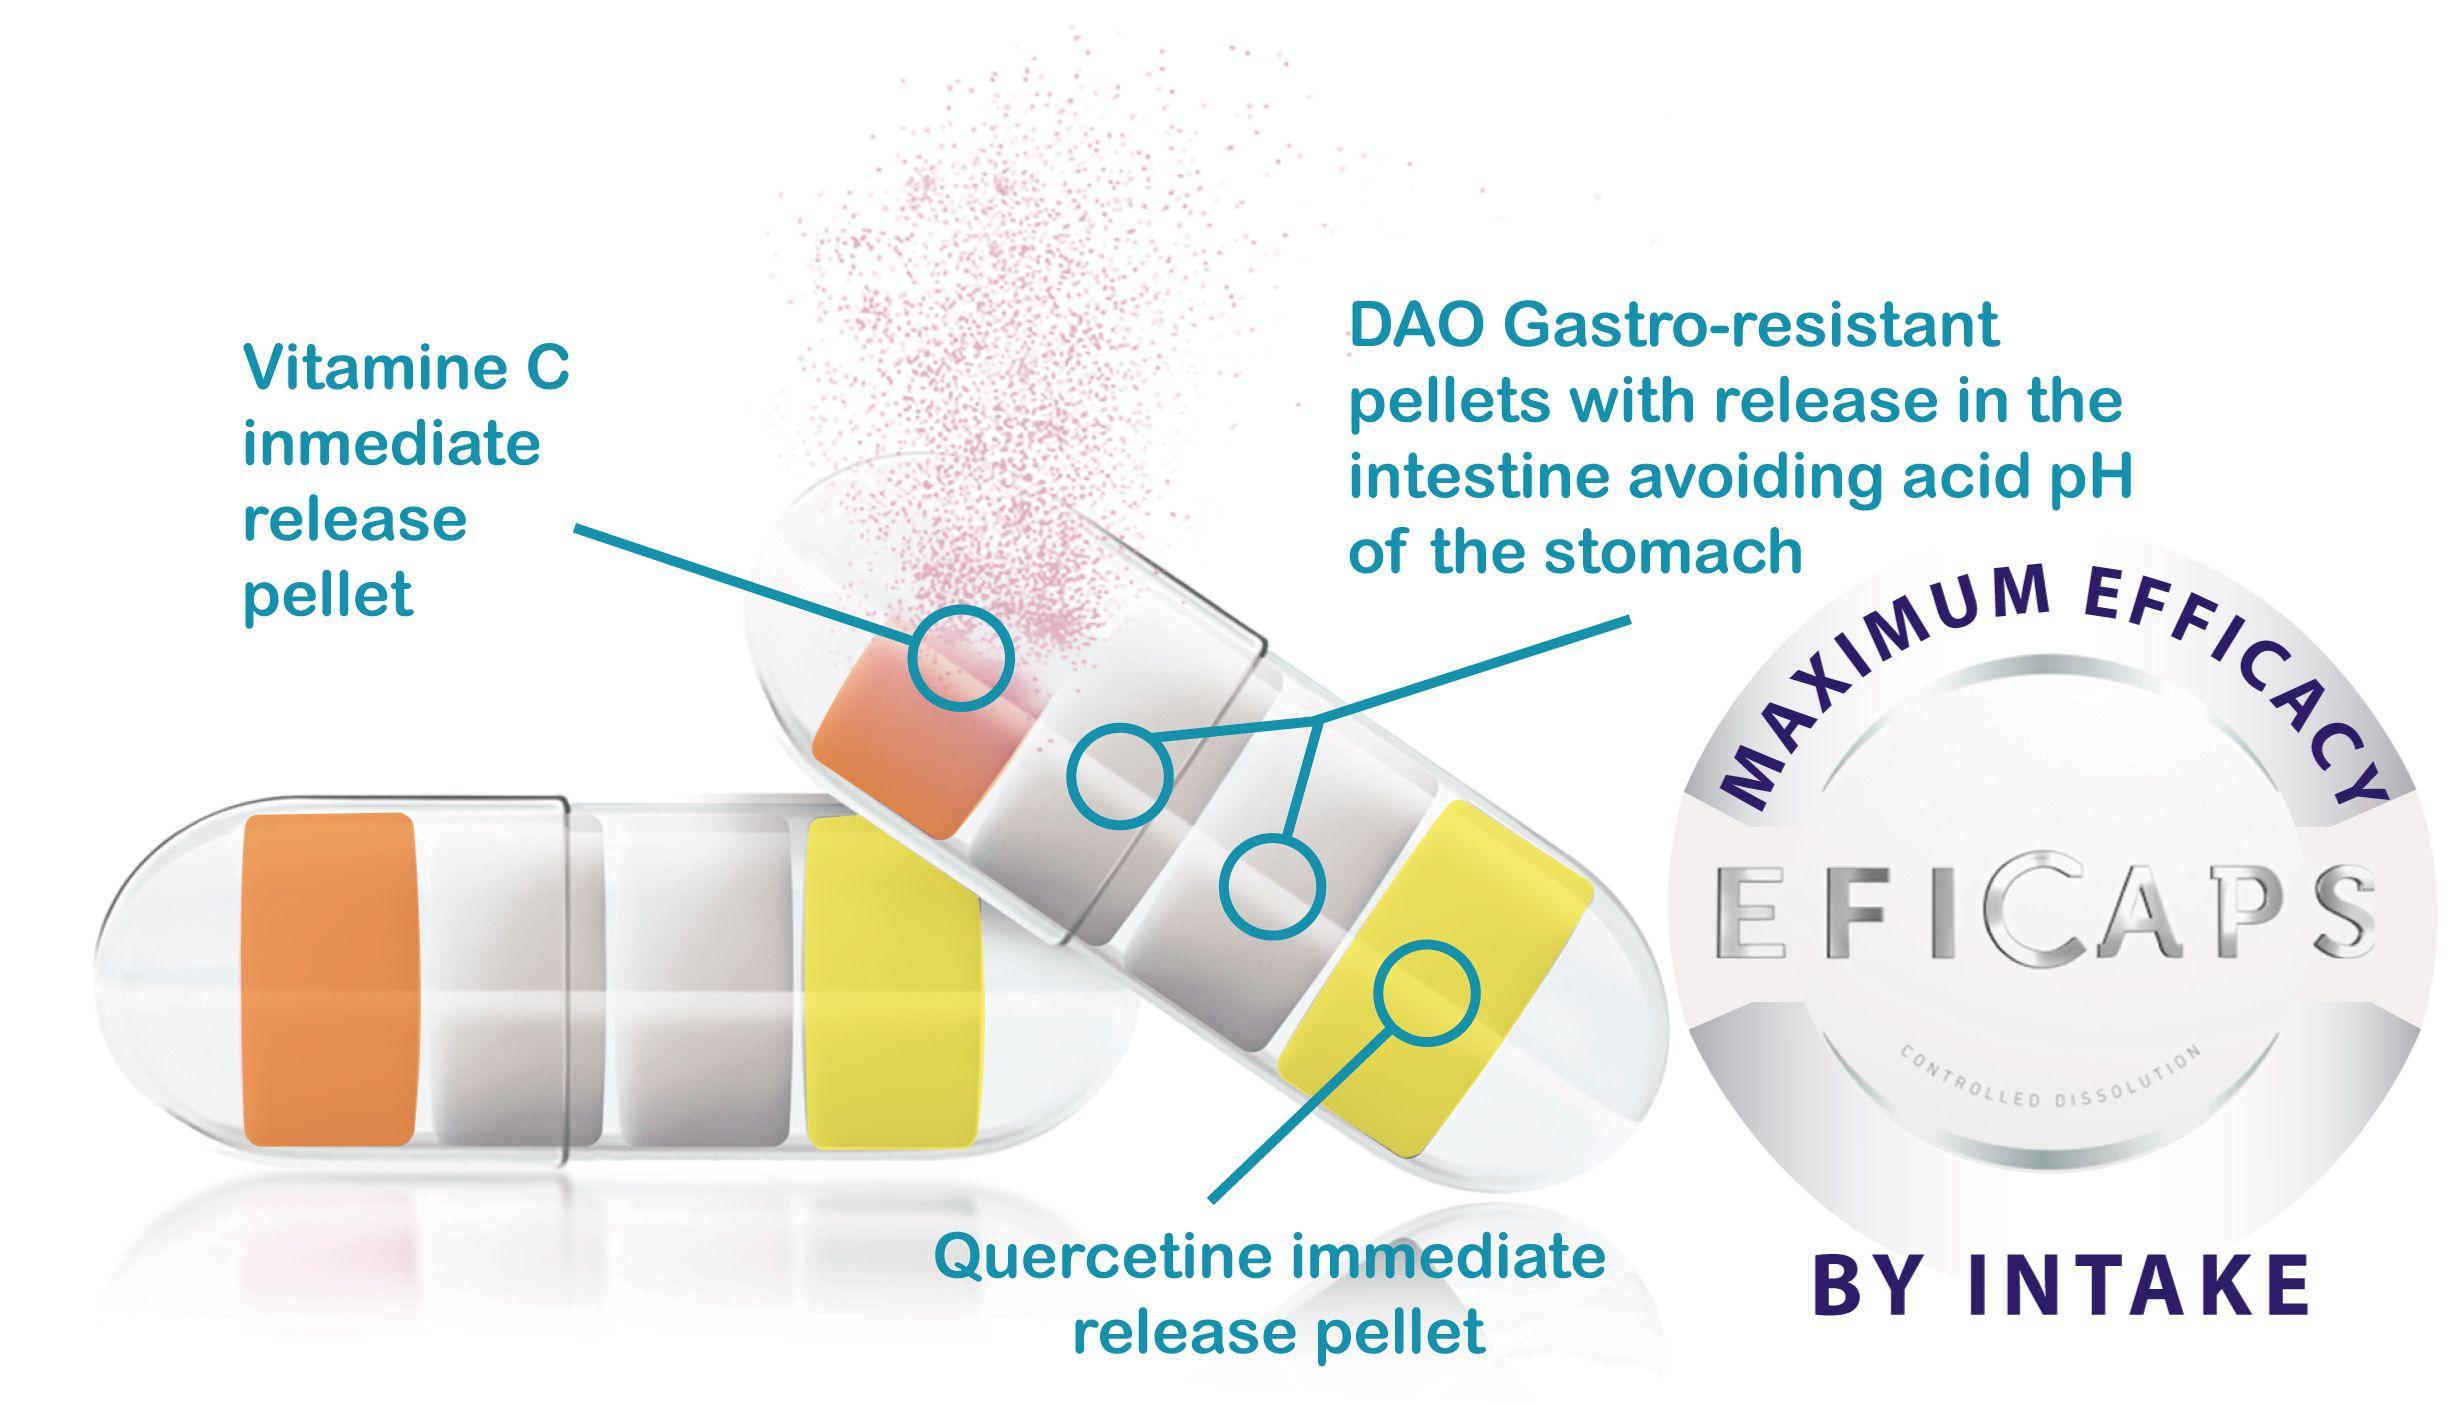 EFICAPS, daoFOOD plus, DAO, diamine oxidase, histamine